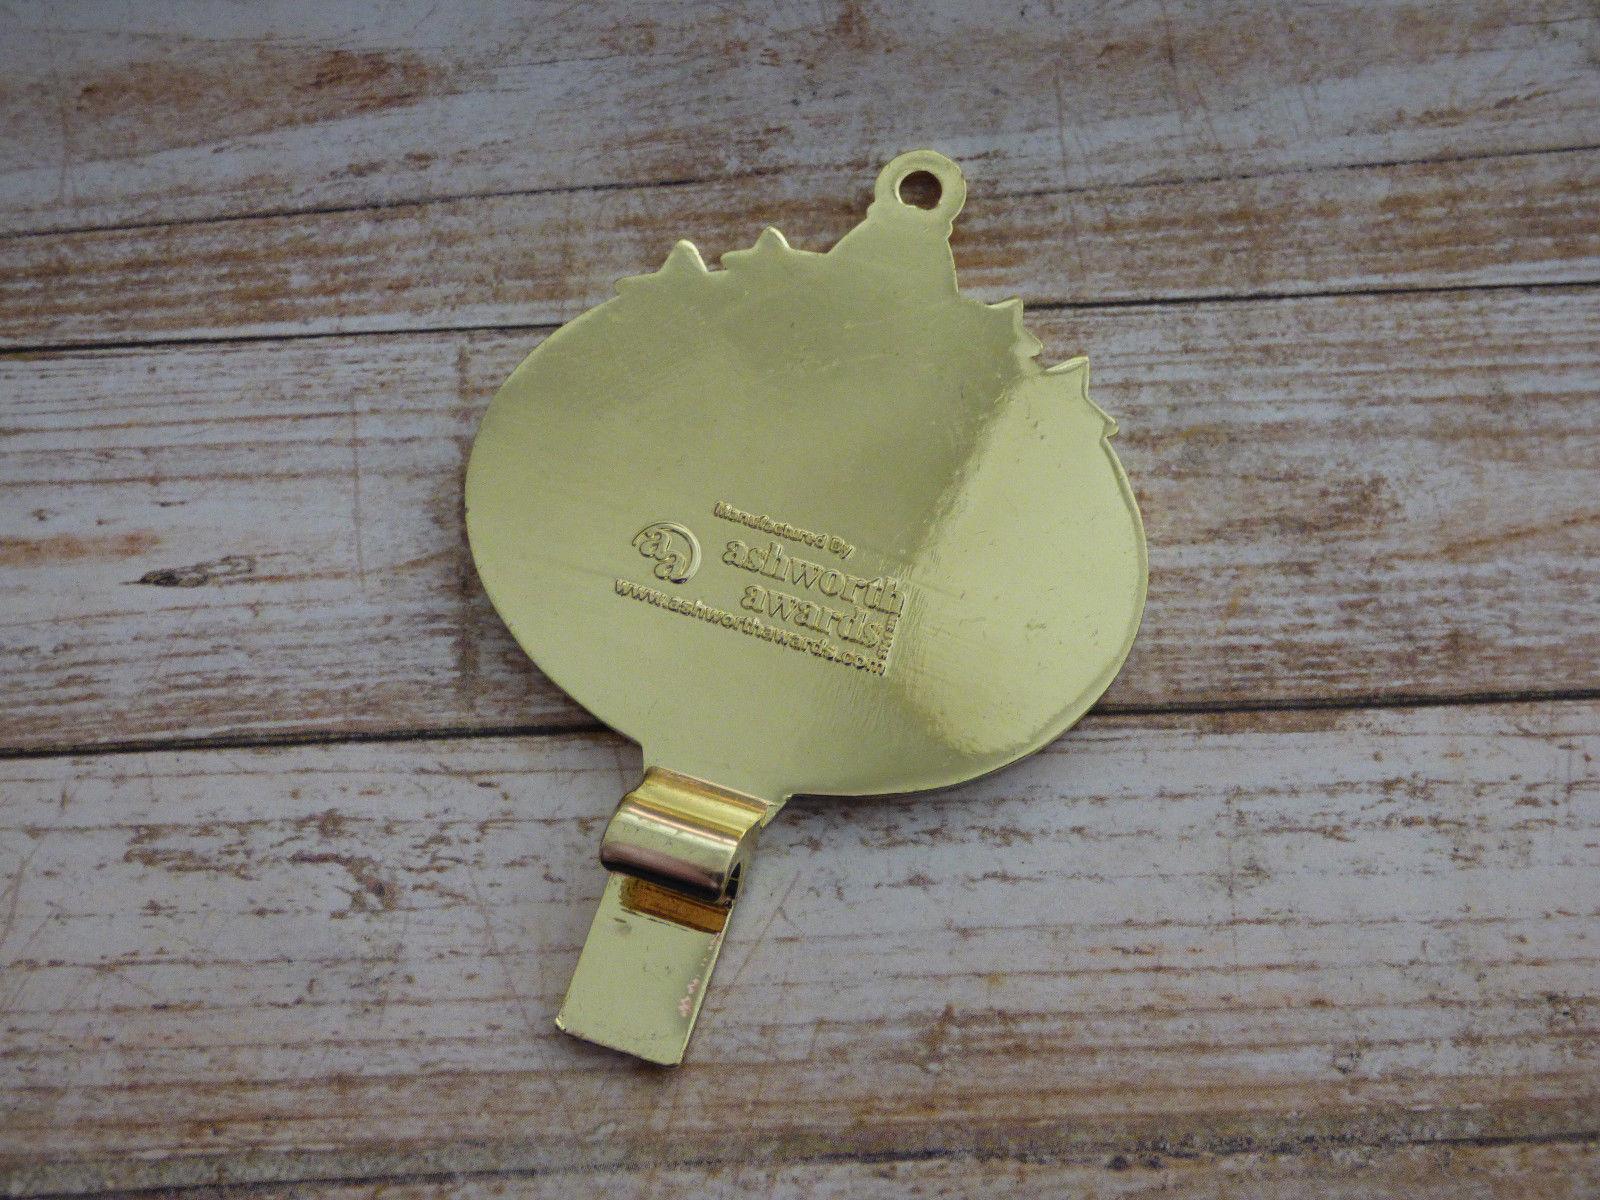 Marine Corps Sand Sational 8K Beach Run Grand Prix Series Medal Bottle Opener